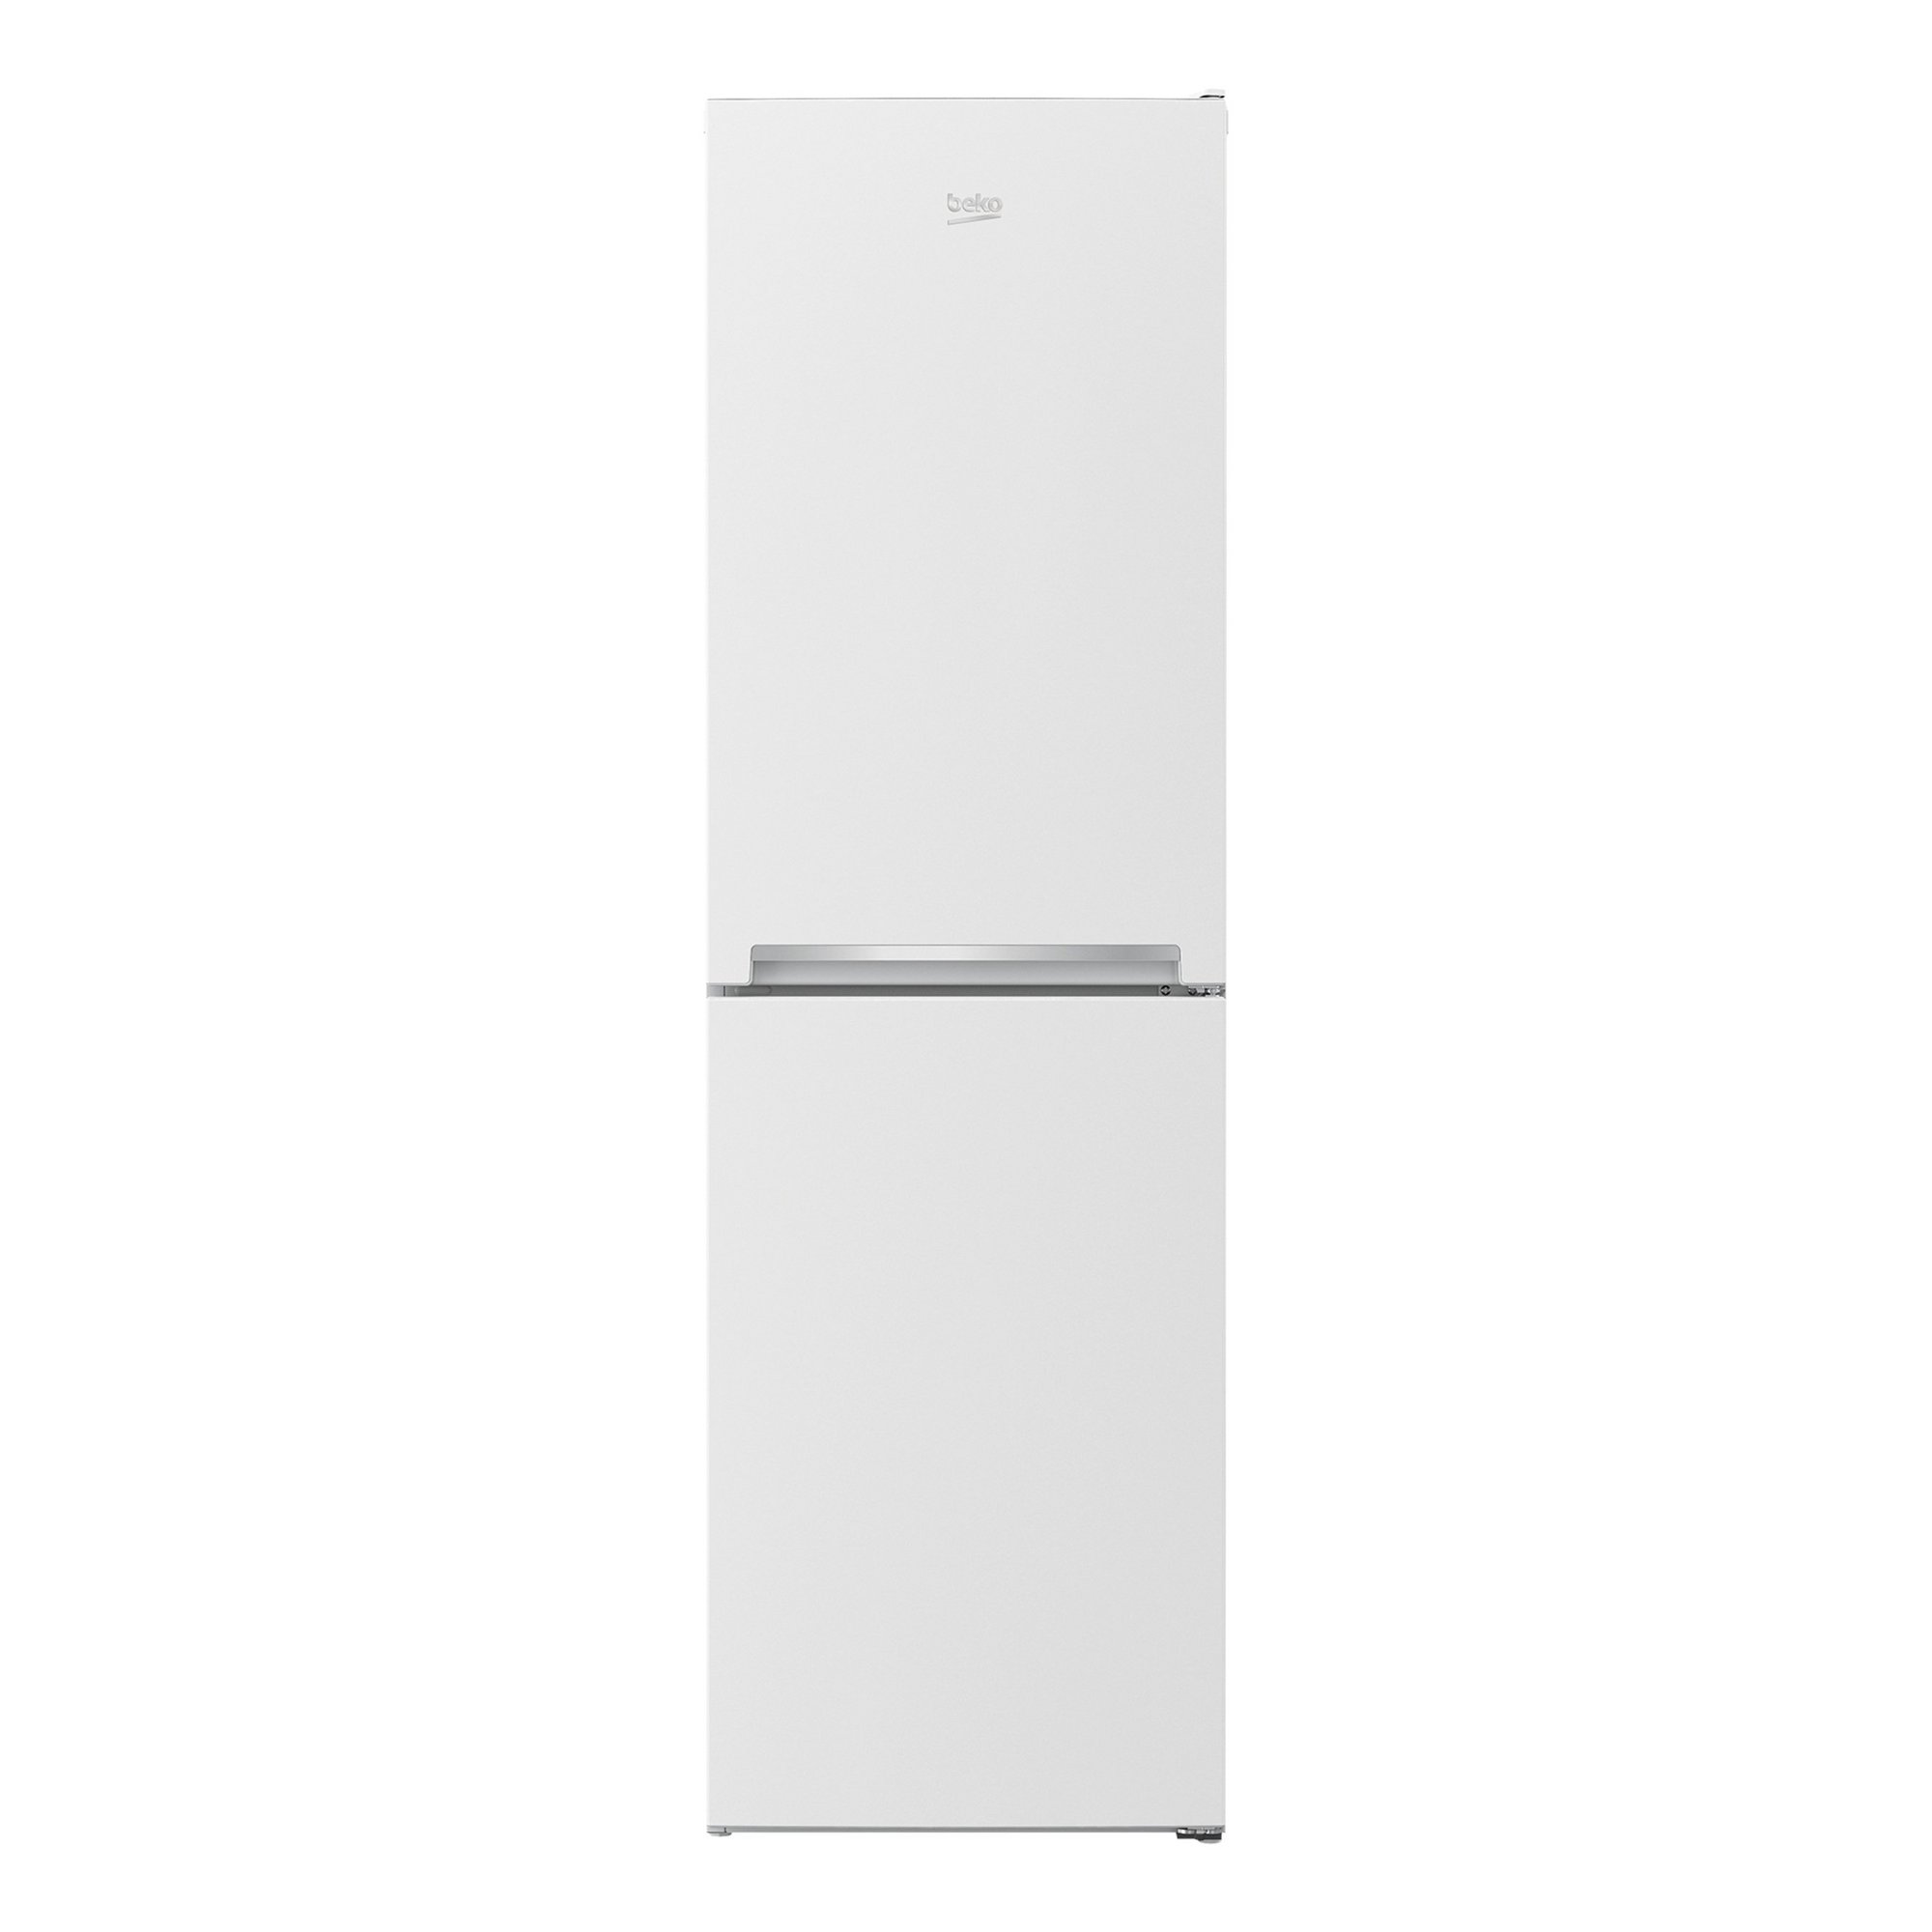 Image of Beko 182/54cm Frost Free Fridge Freezer